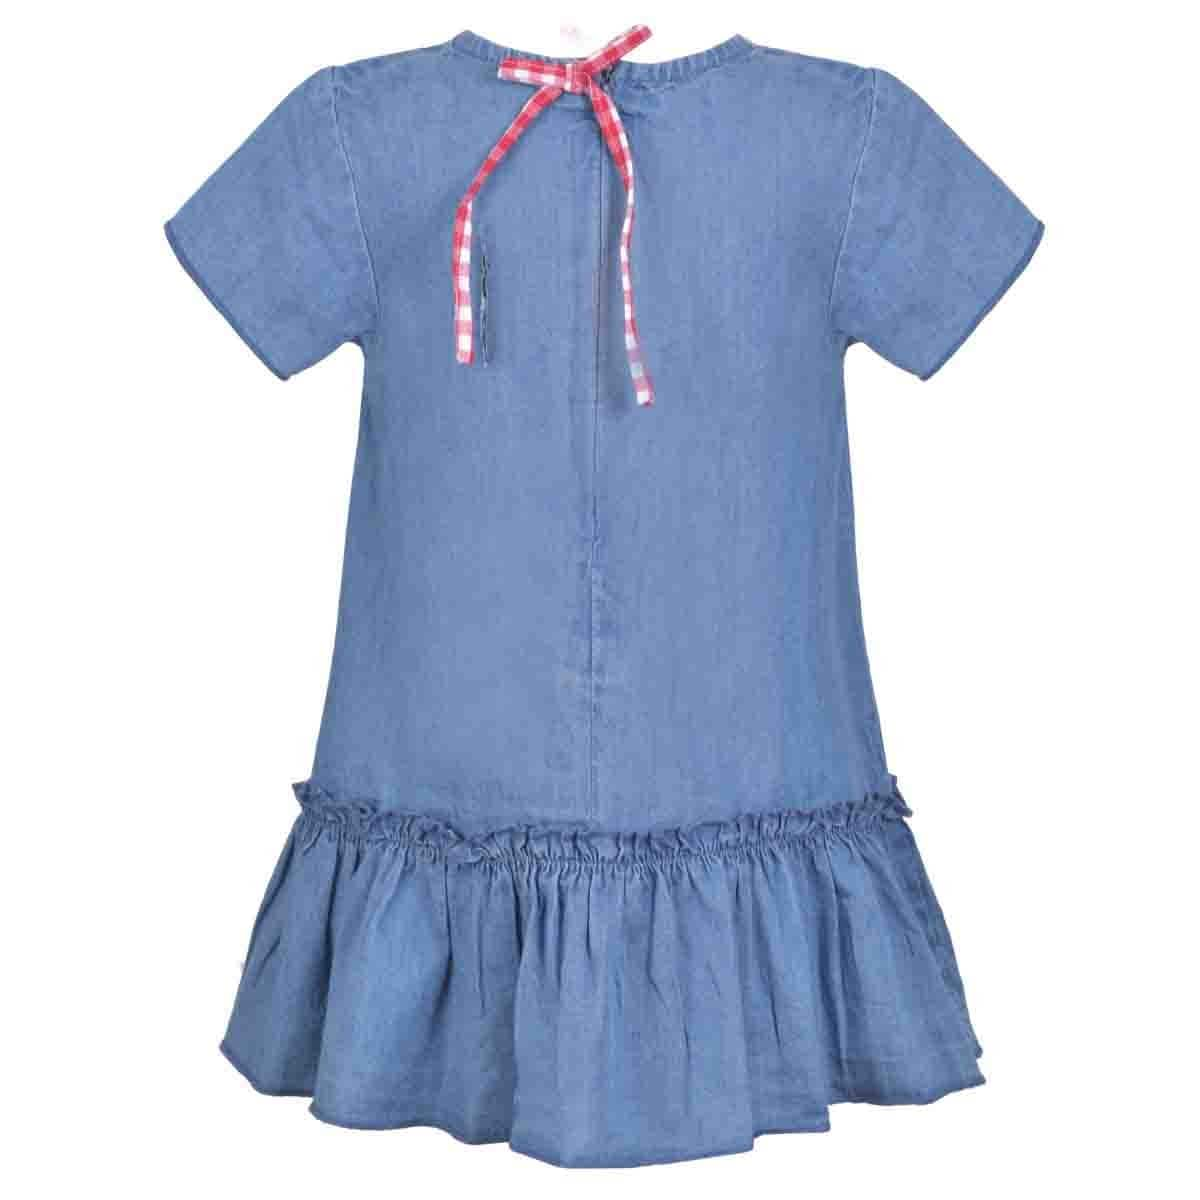 Vestido Mezclilla Panty Rayas Carosello